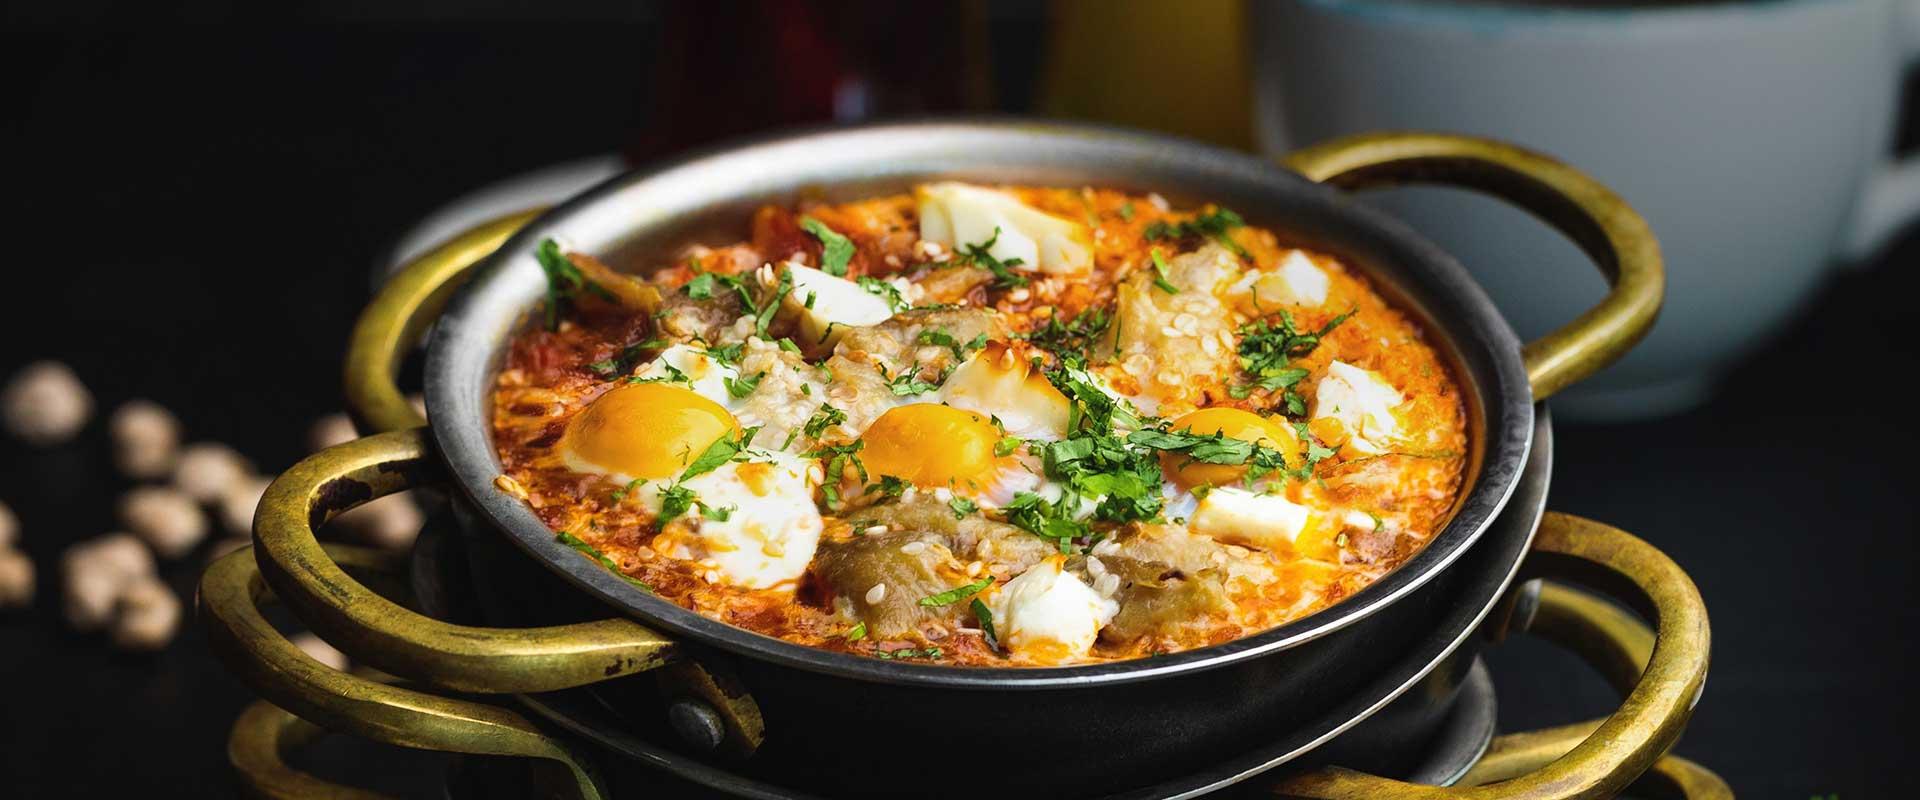 Restaurant Recipes Curry2Night